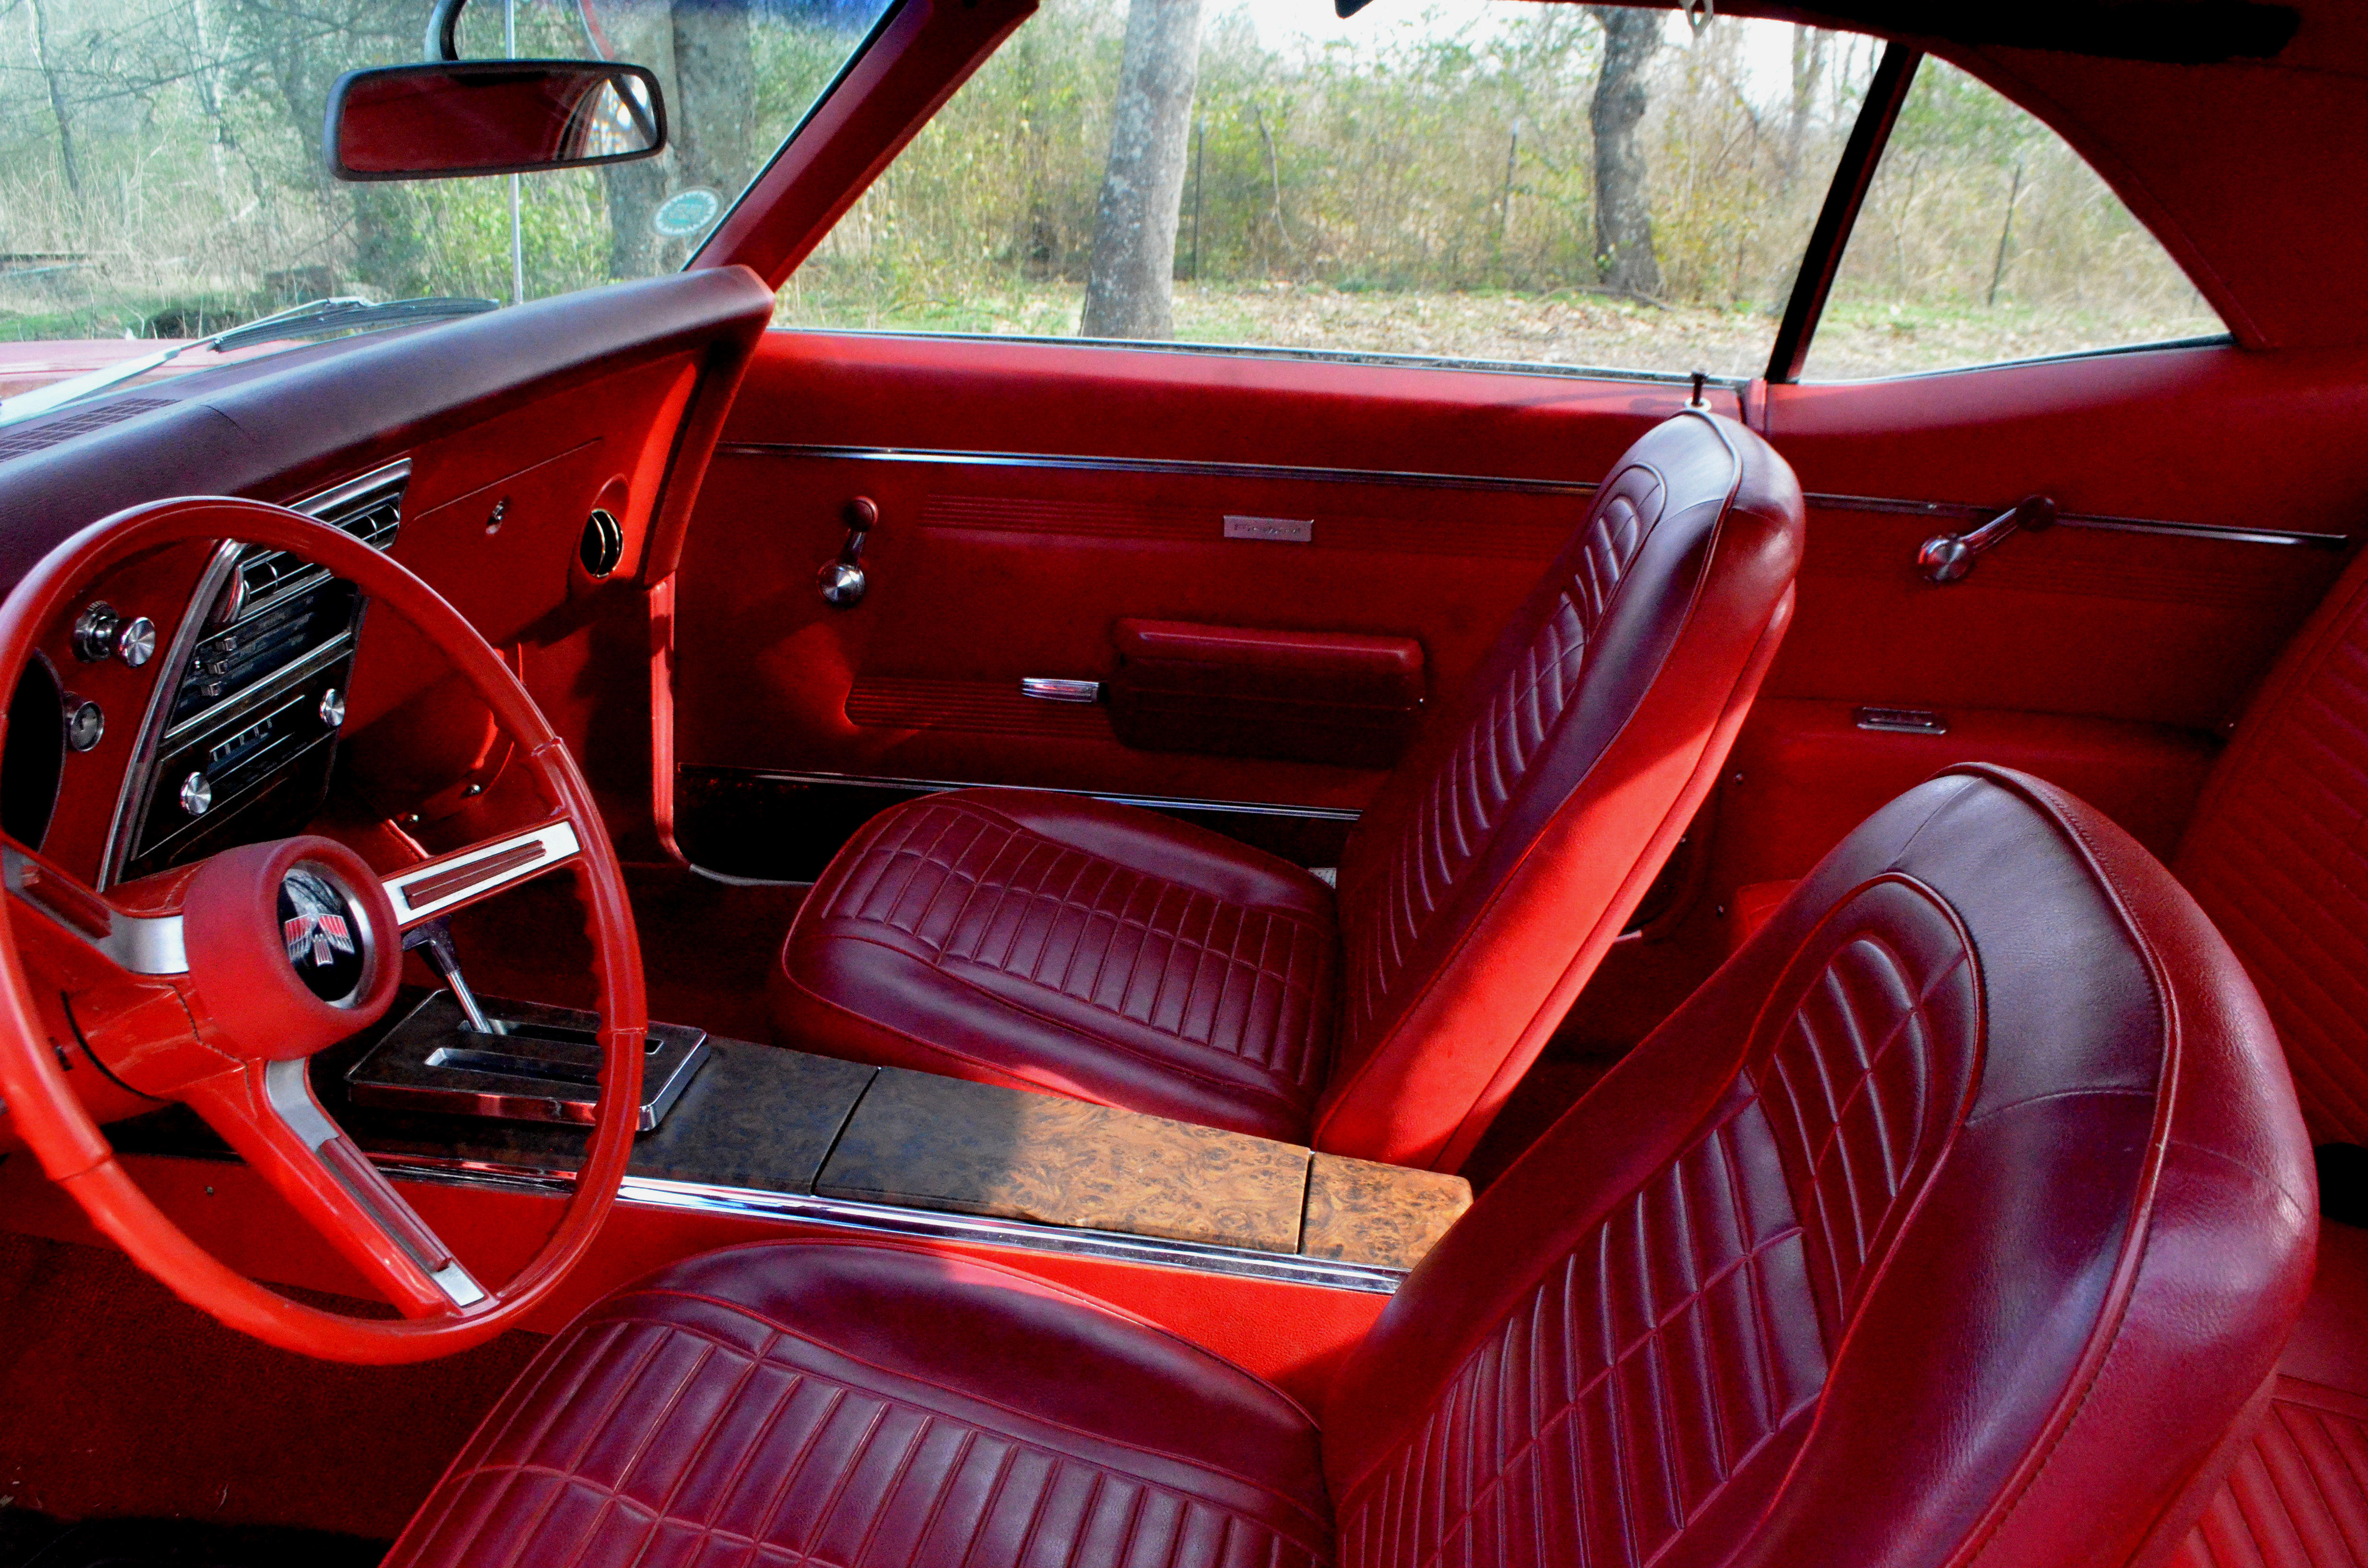 1968 Firebird Interior